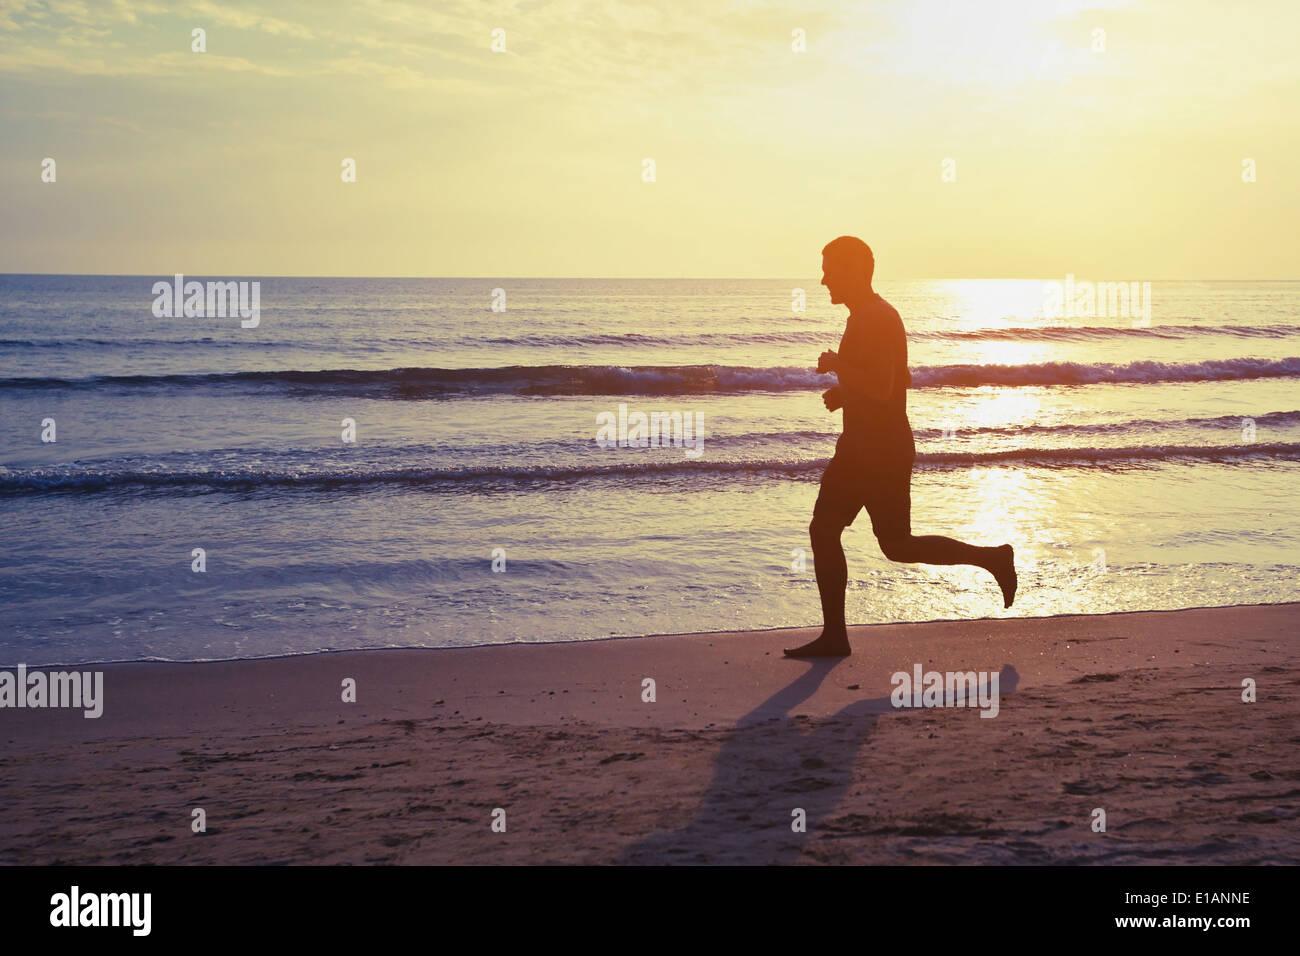 gesunder Lebensstil, Silhouette der Läufer am Strand Stockfoto